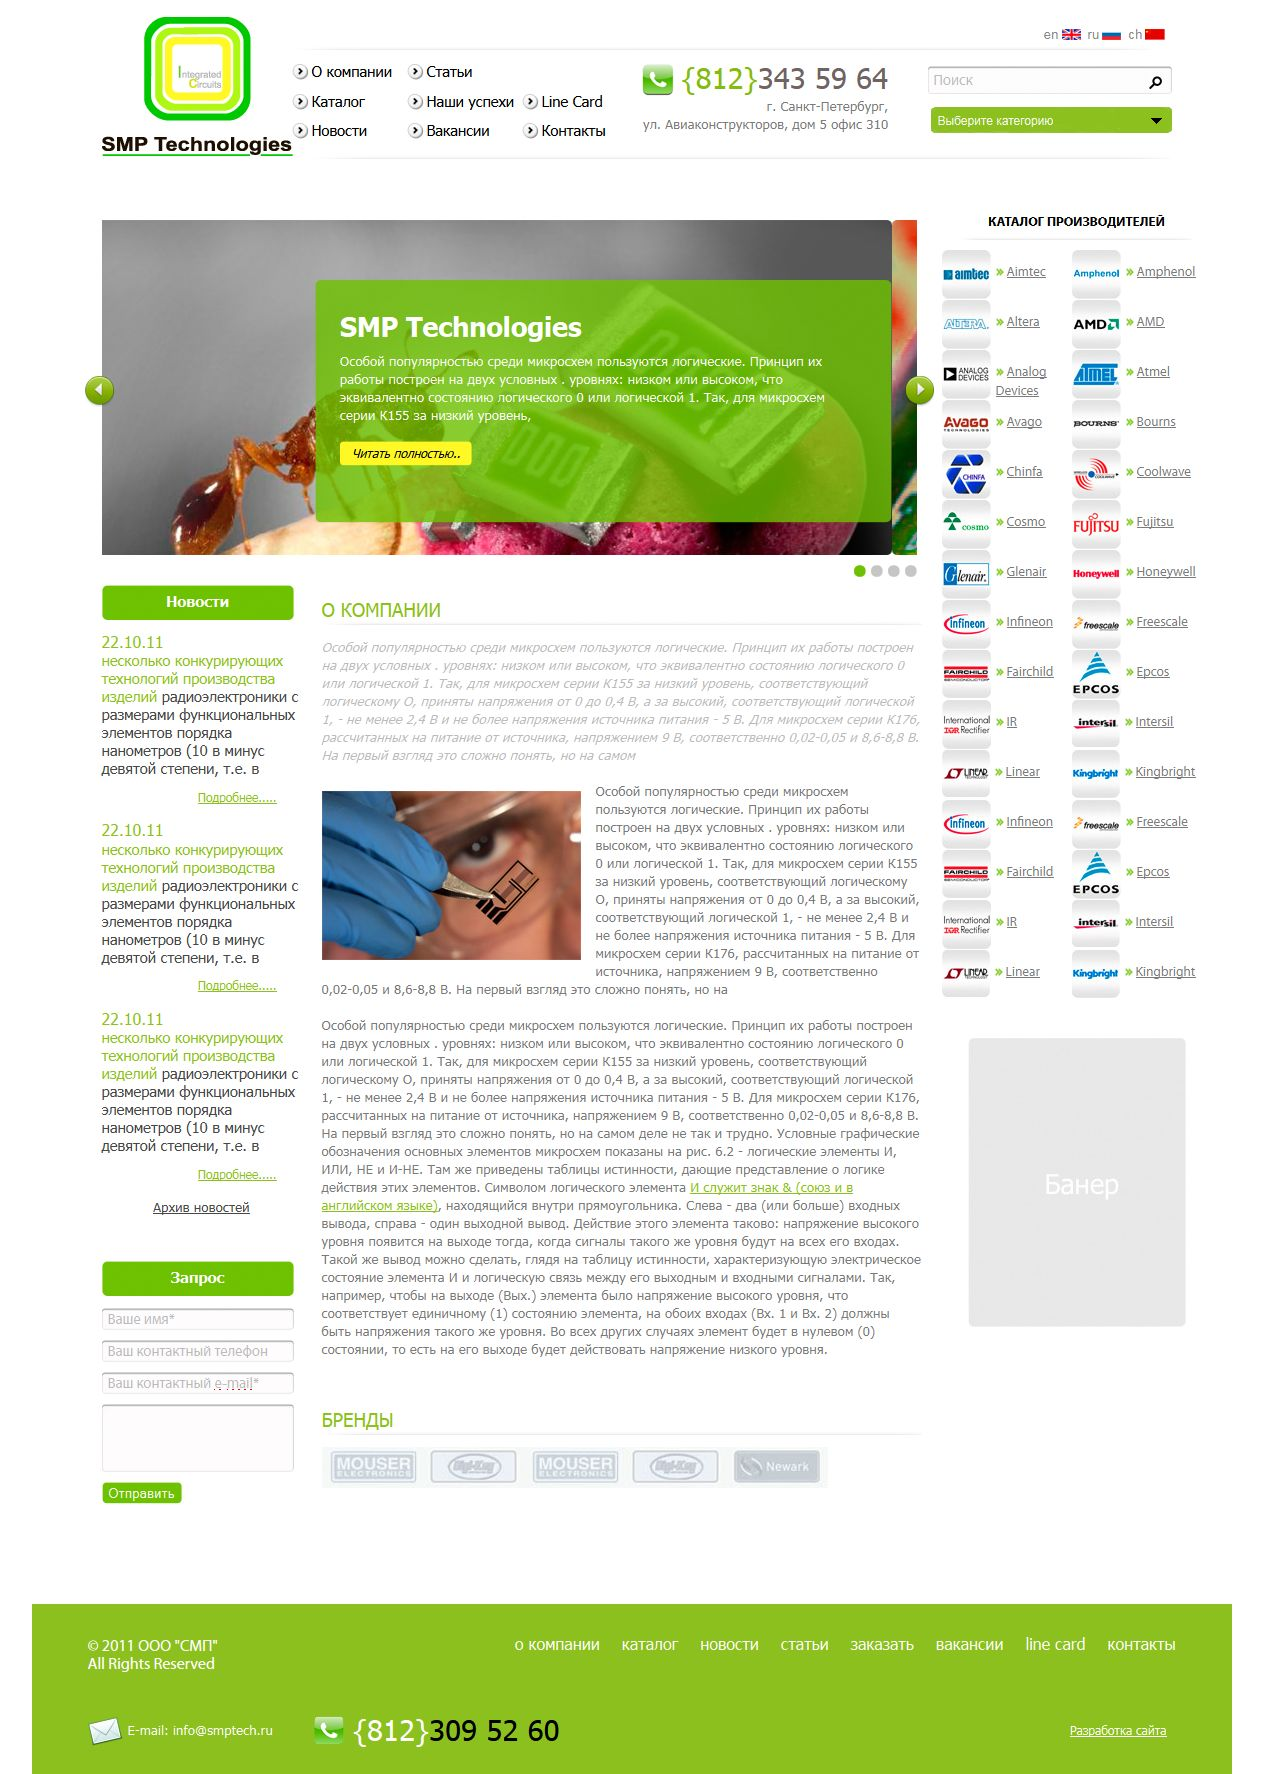 сайт компании SMP Technologies